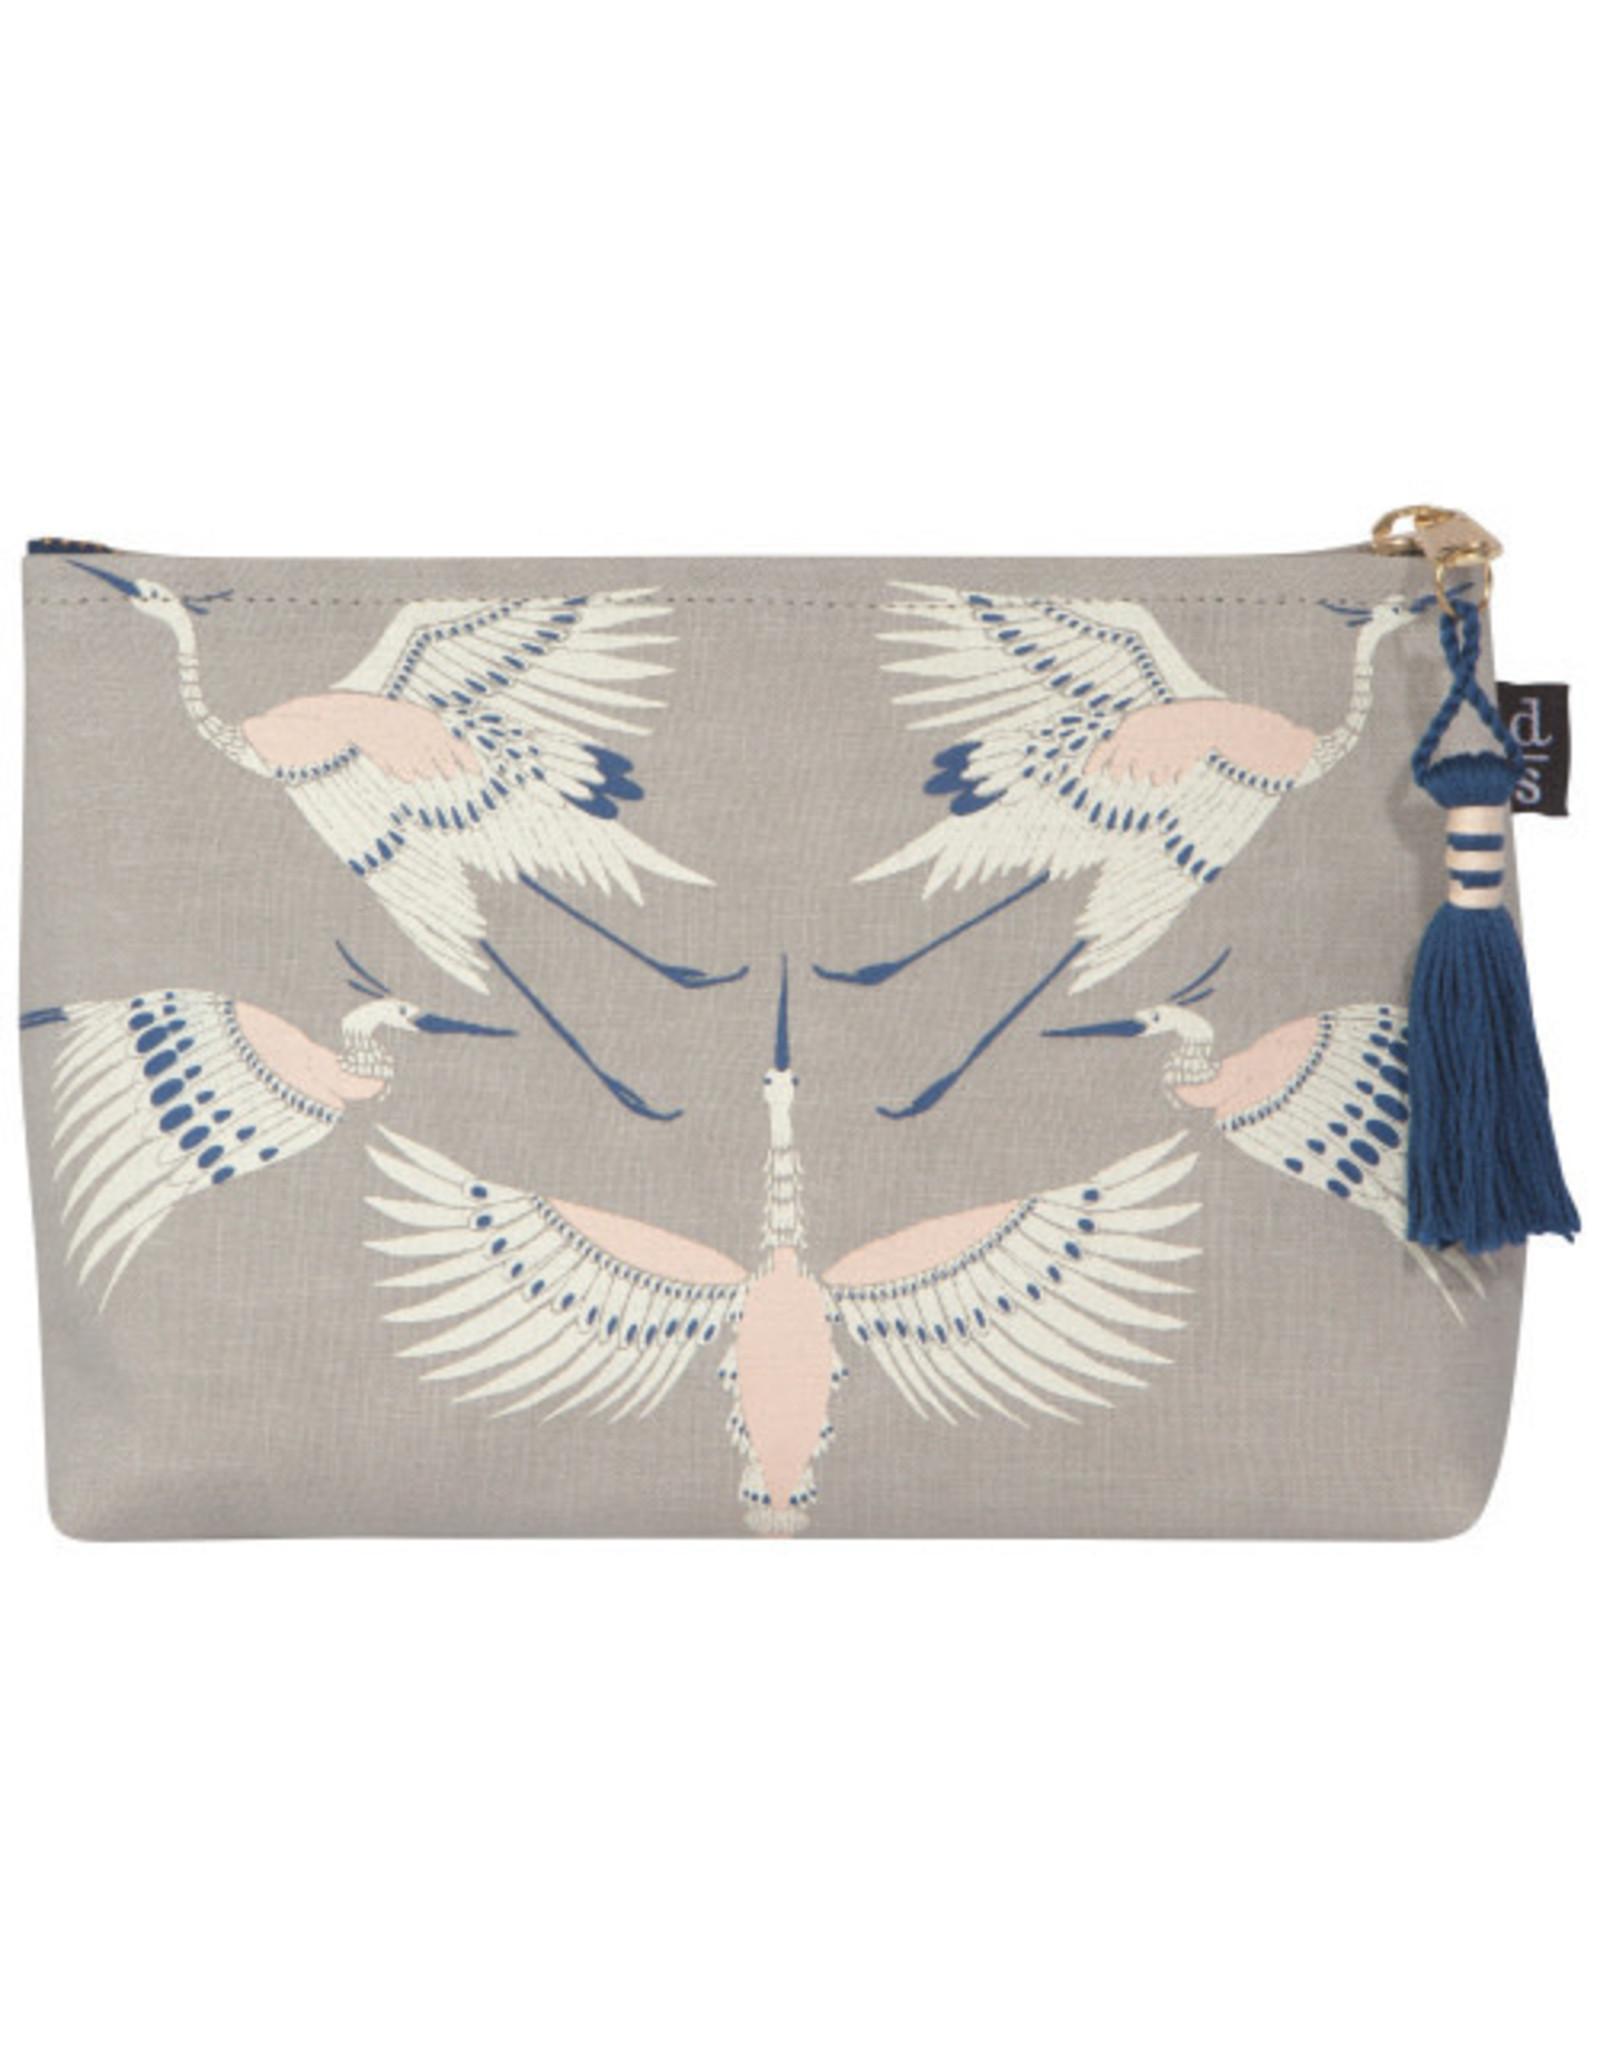 Flight of Fancy Linen Cosmetic Bag Small